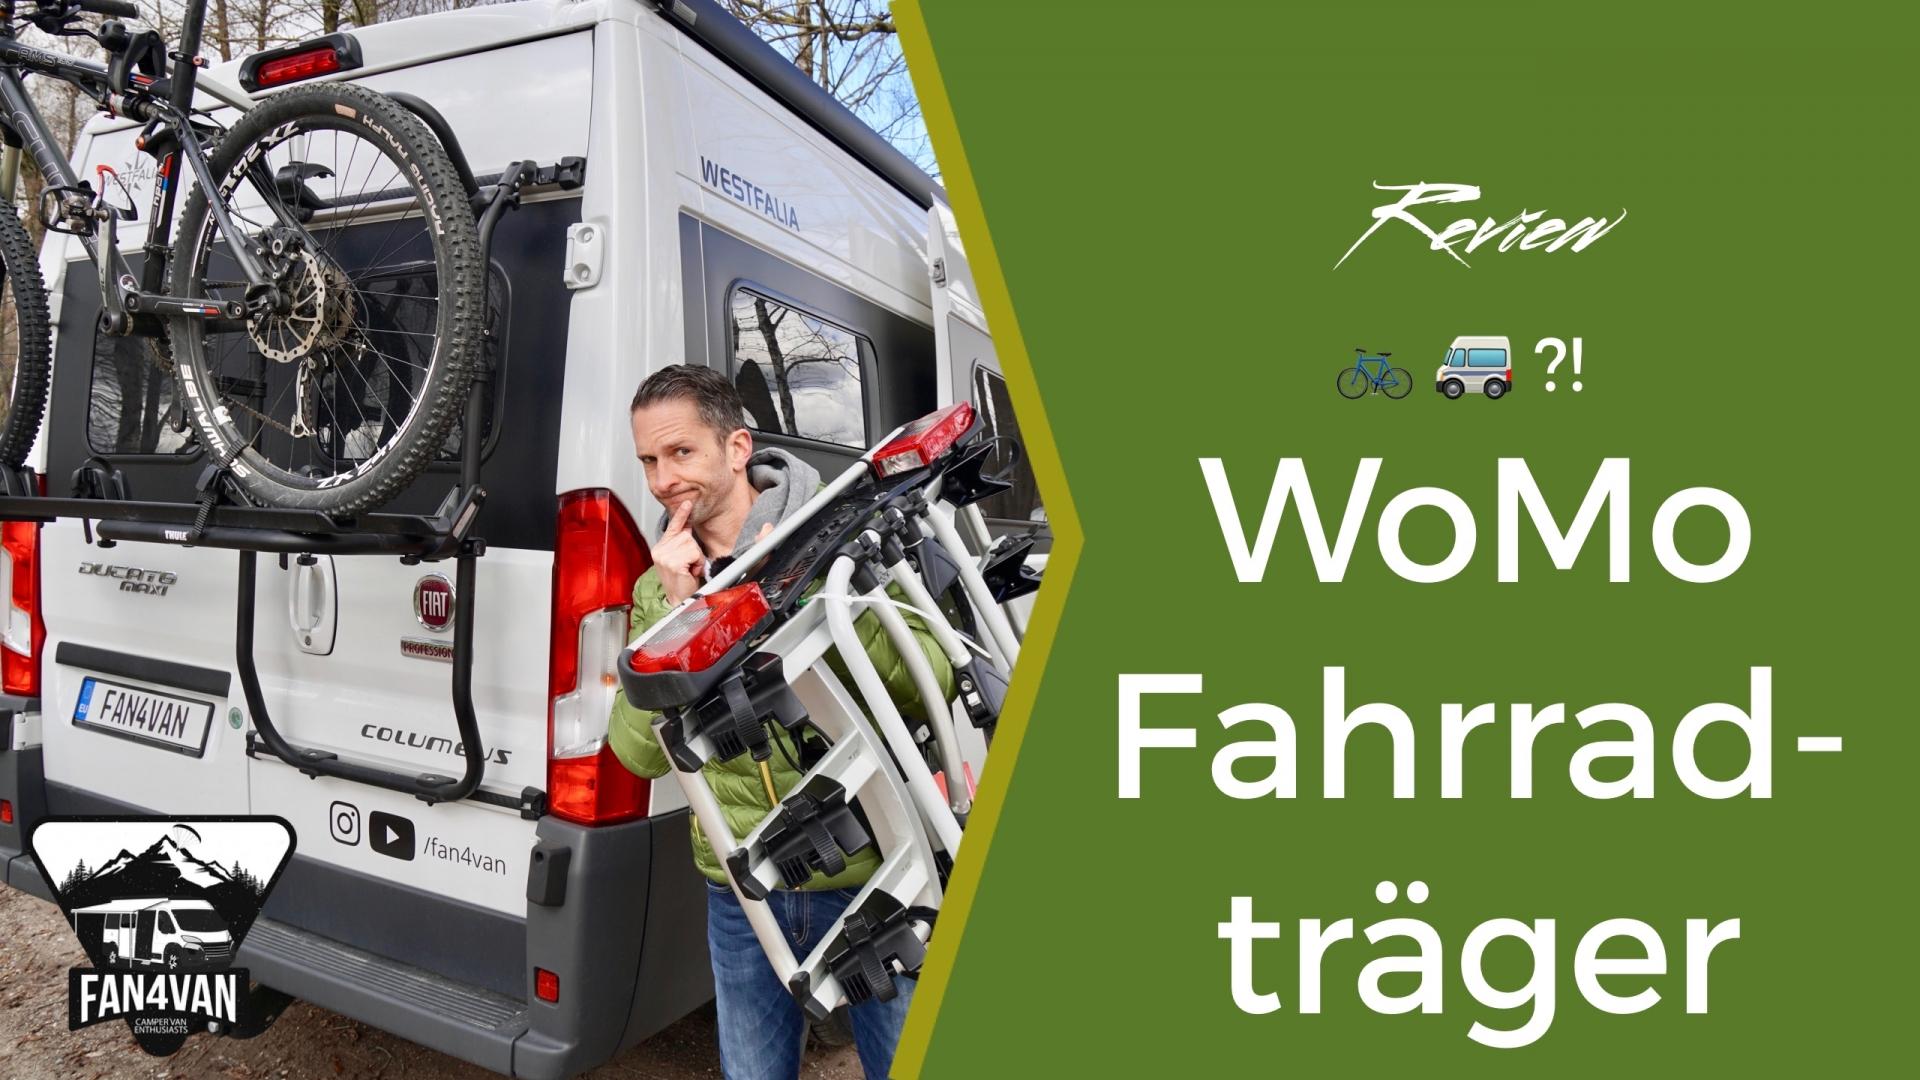 Wohnmobil Fahrradträger - Heck- oder Kupplungsträger?